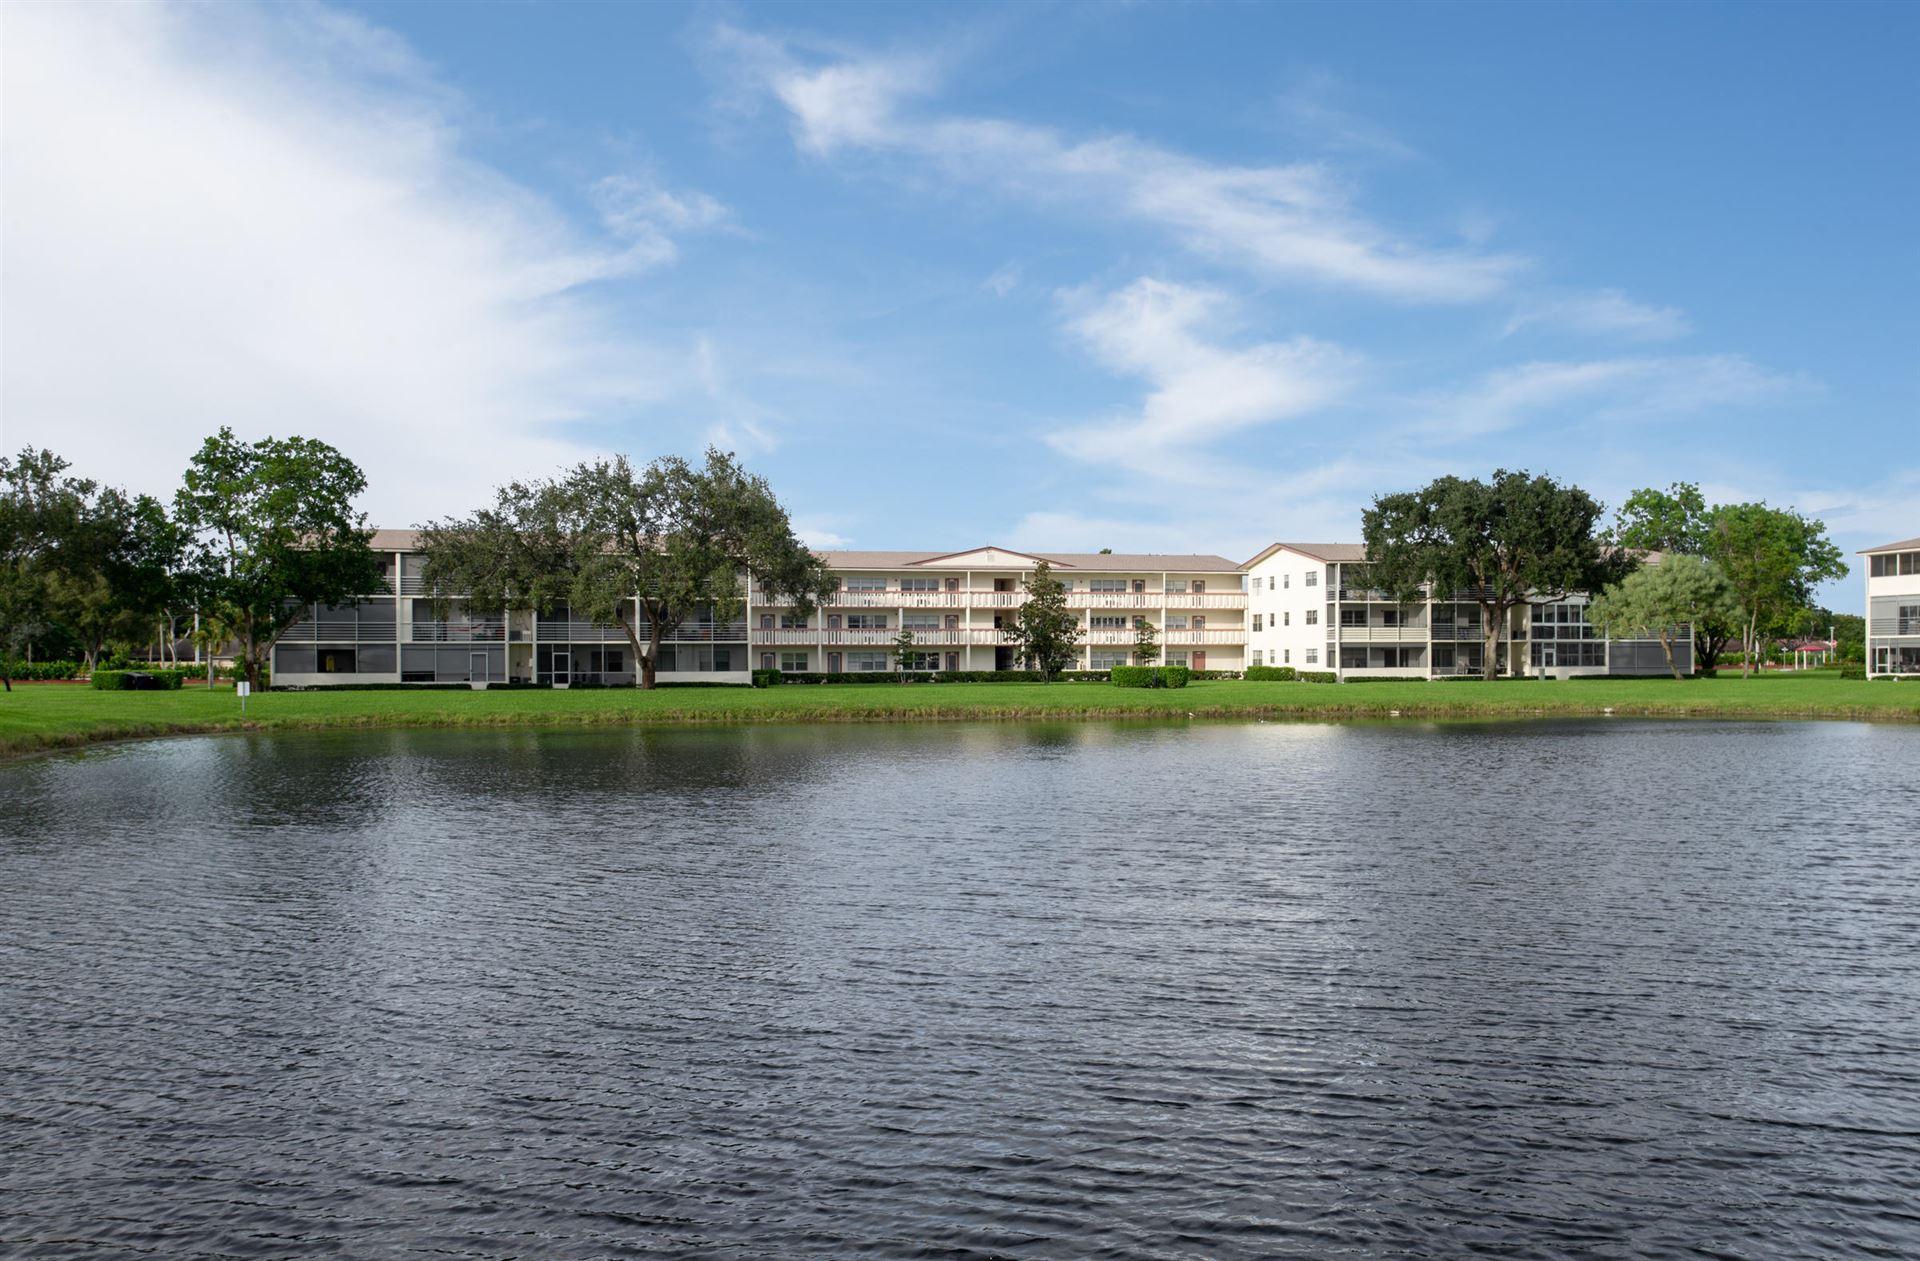 82 Preston B, Boca Raton, FL 33434 - #: RX-10669591